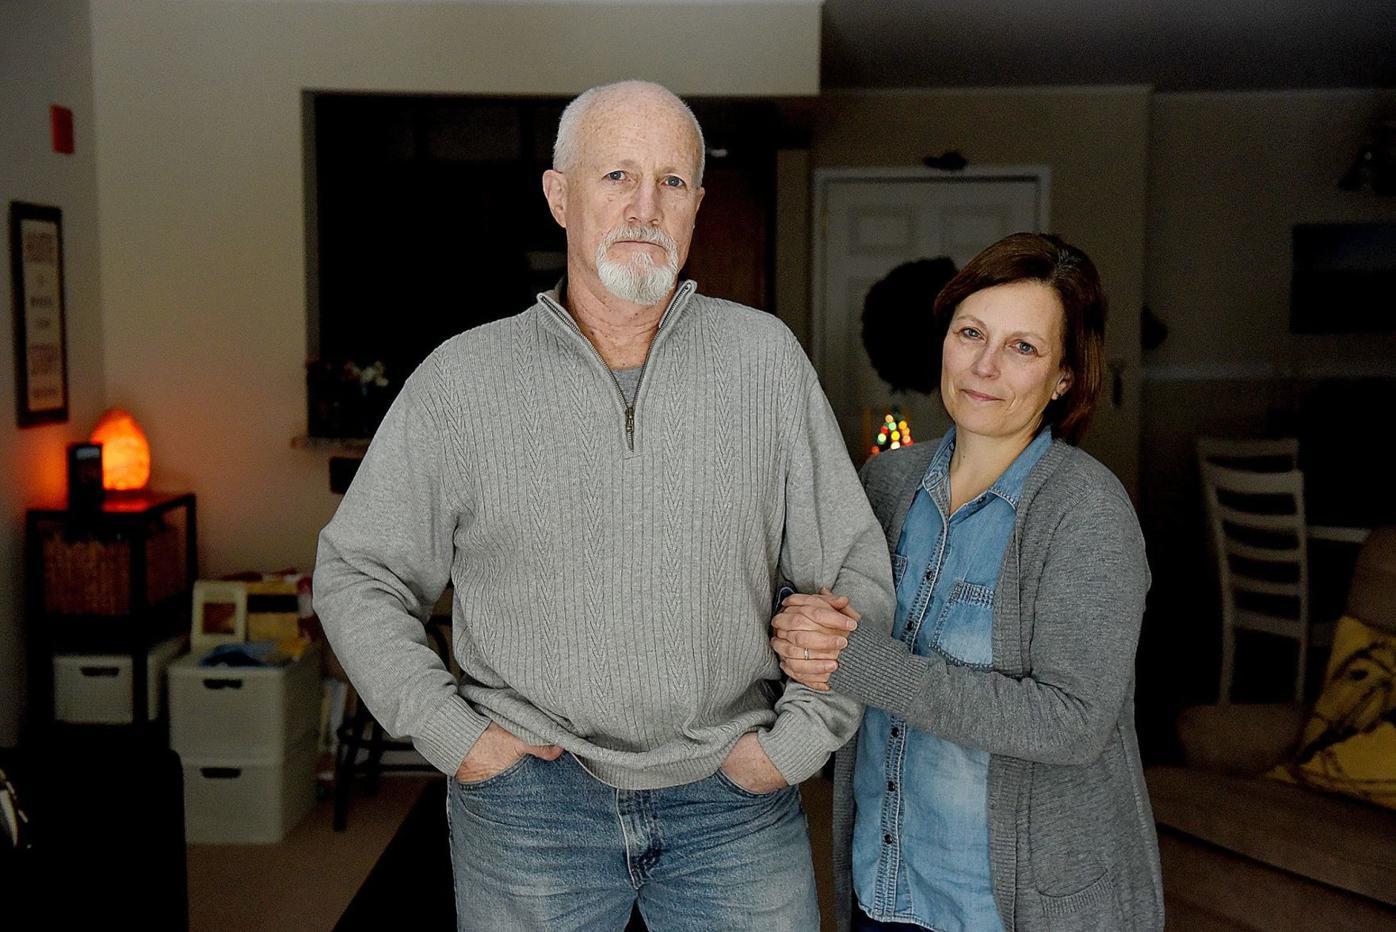 Bill Murphy and wife, Lisa